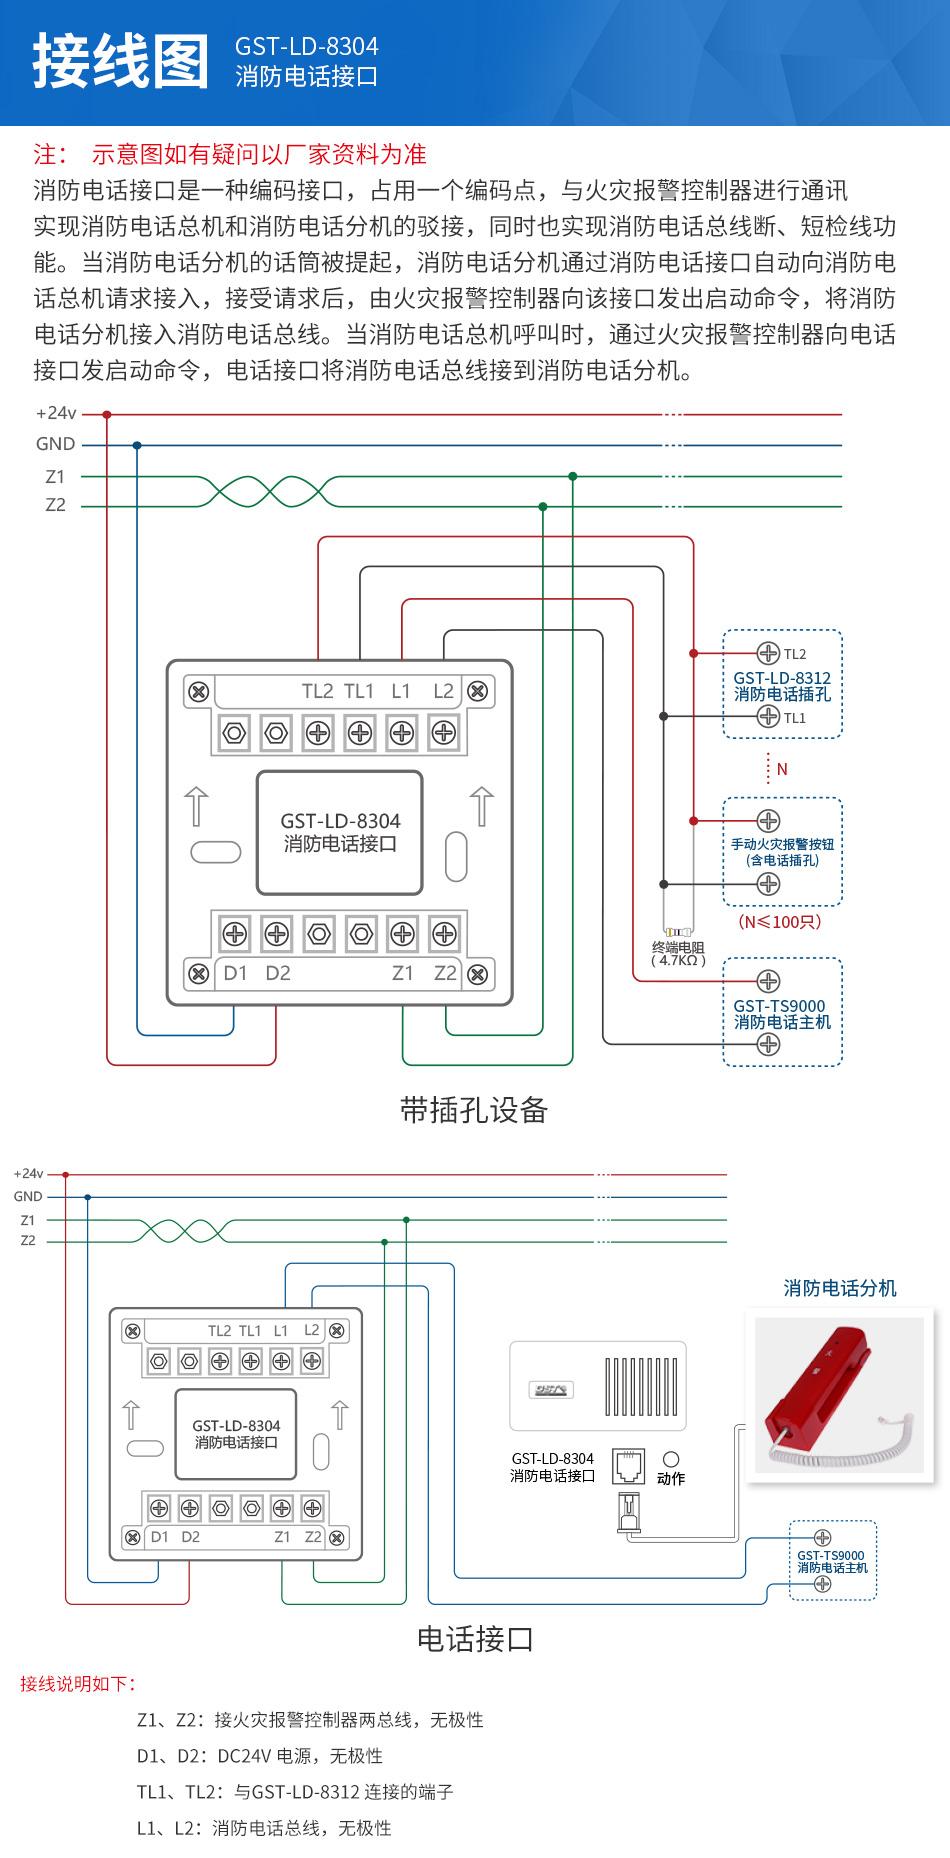 GST-LD-8304消防电话模块接线